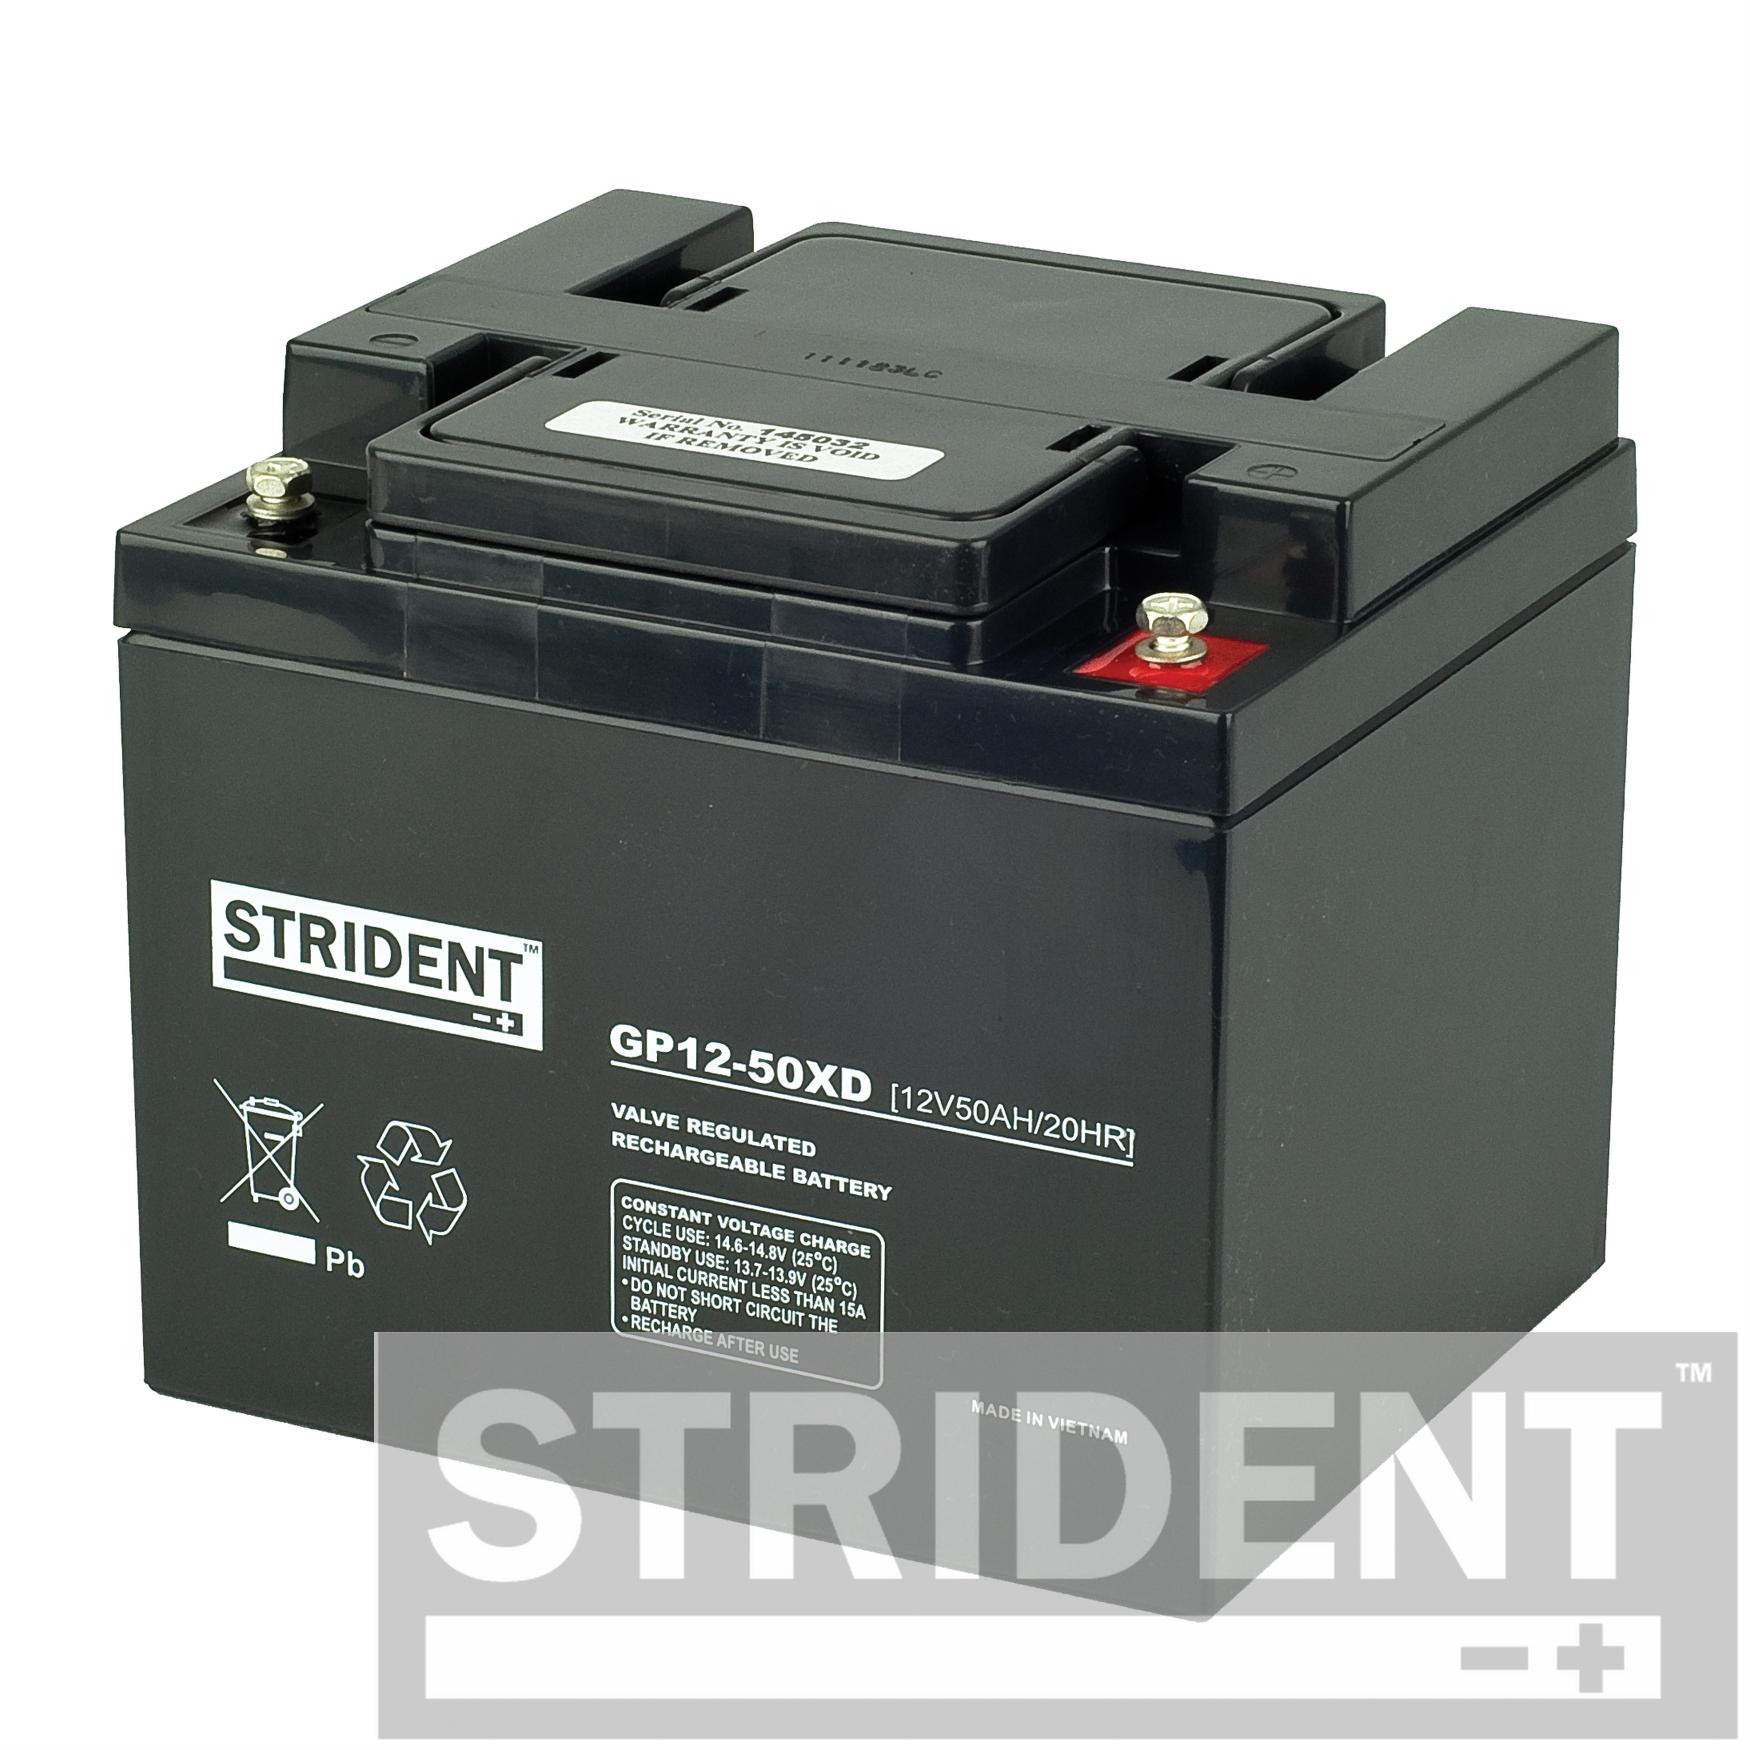 strident-agm-battery-gp12-50.jpg